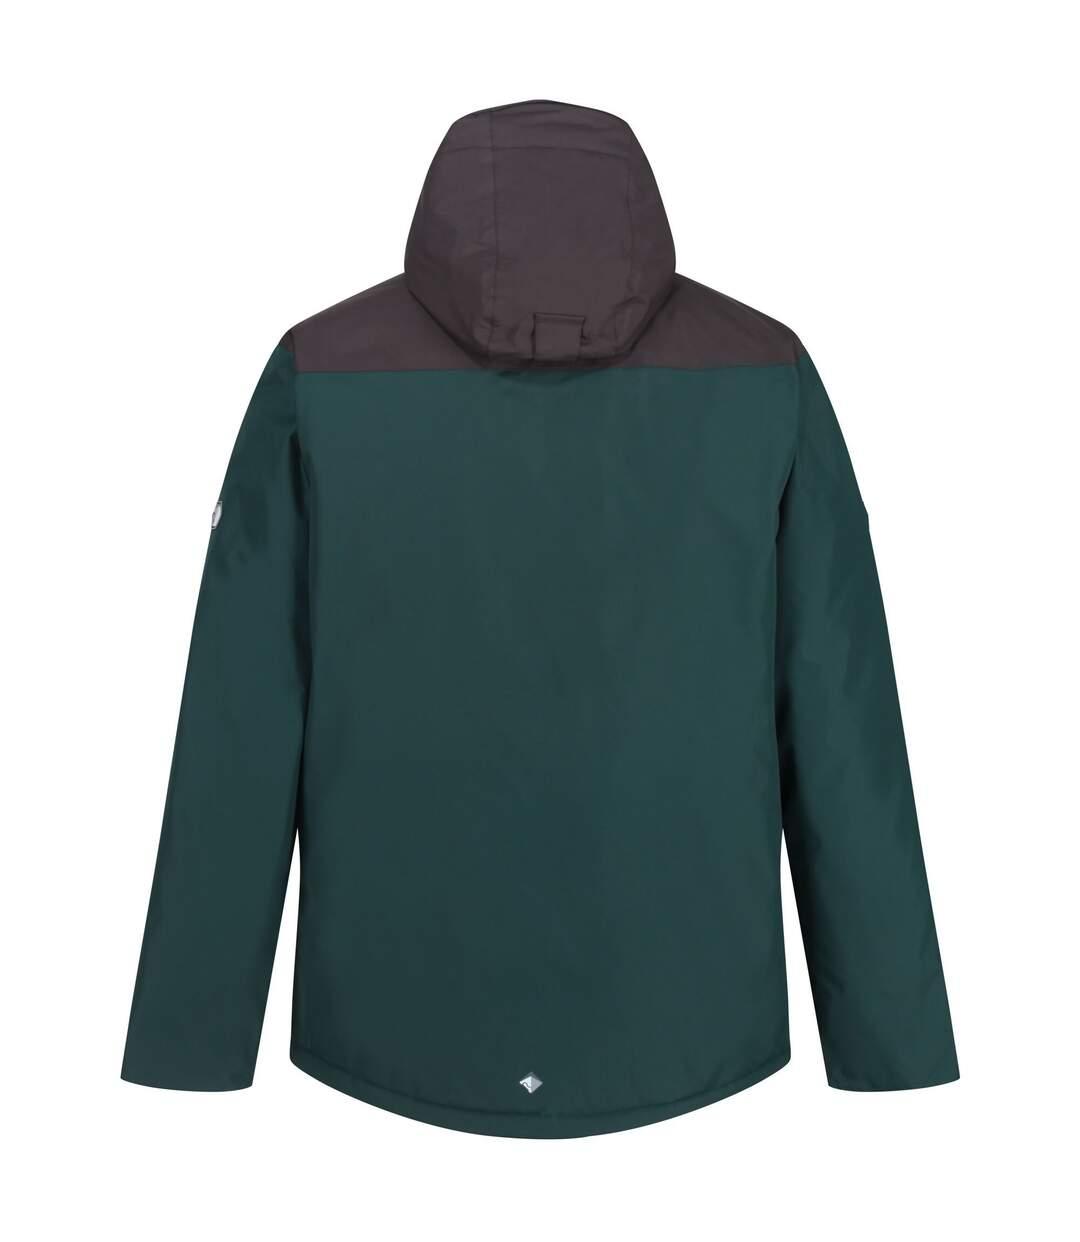 Regatta Mens Thornridge II Insulated Jacket (Deep Pine/Ash) - UTRG4468